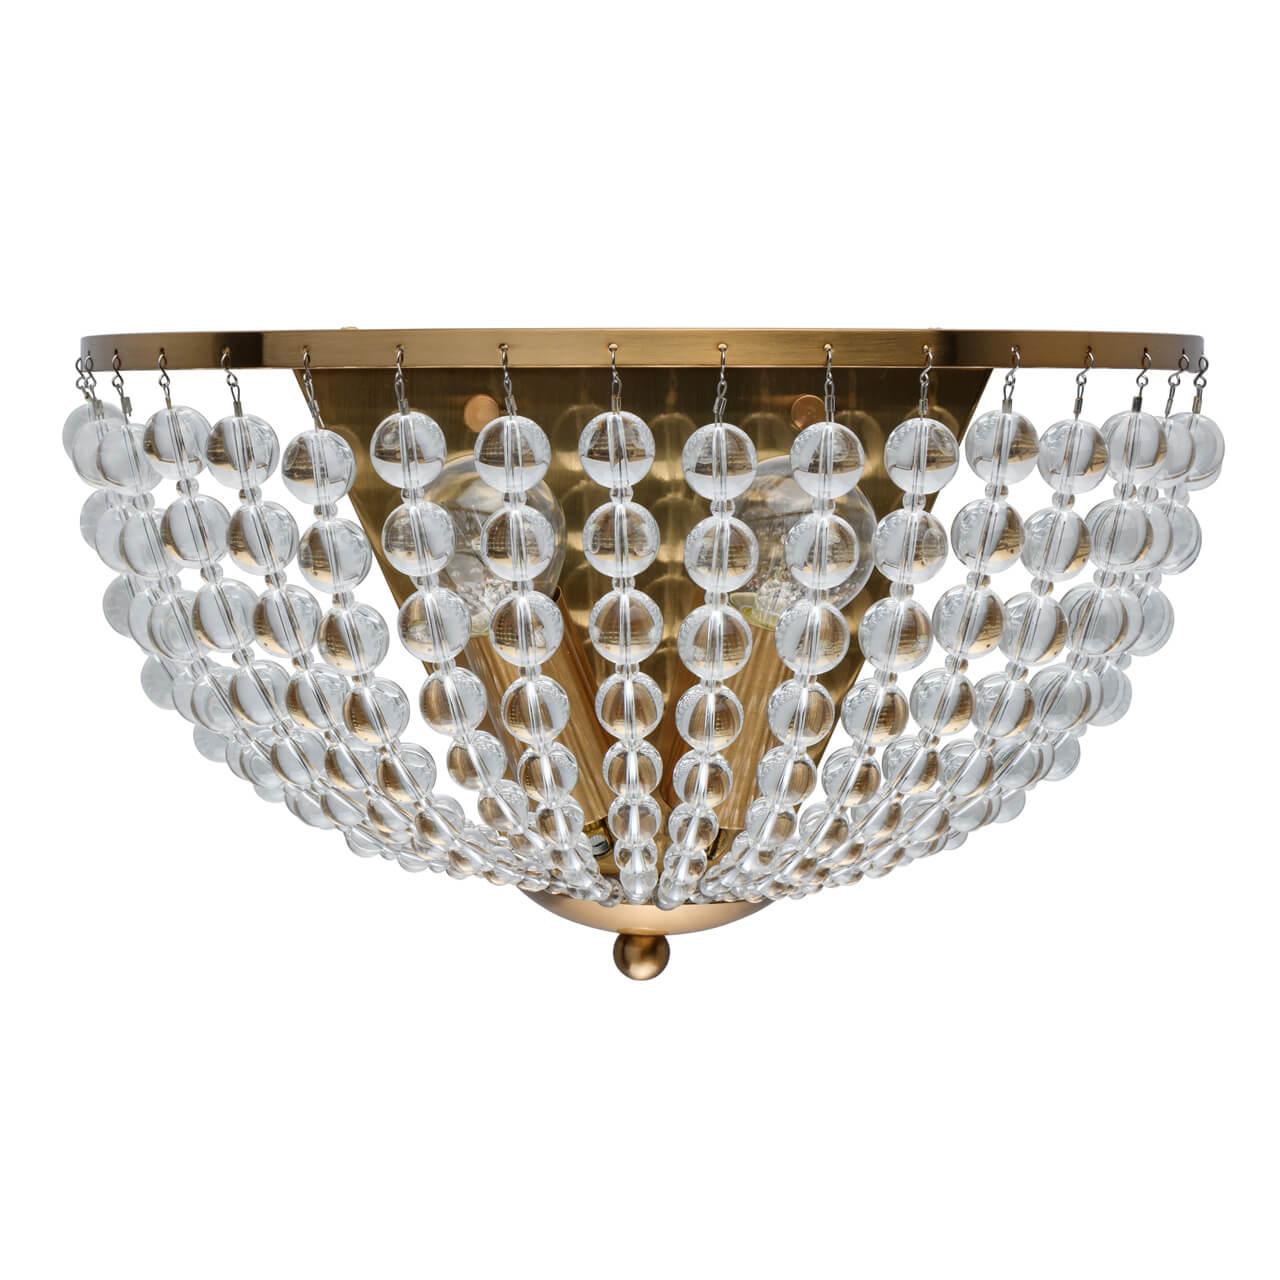 Светильник MW-Light 111023002 Бриз светильник подвесной mw light бриз 464012201